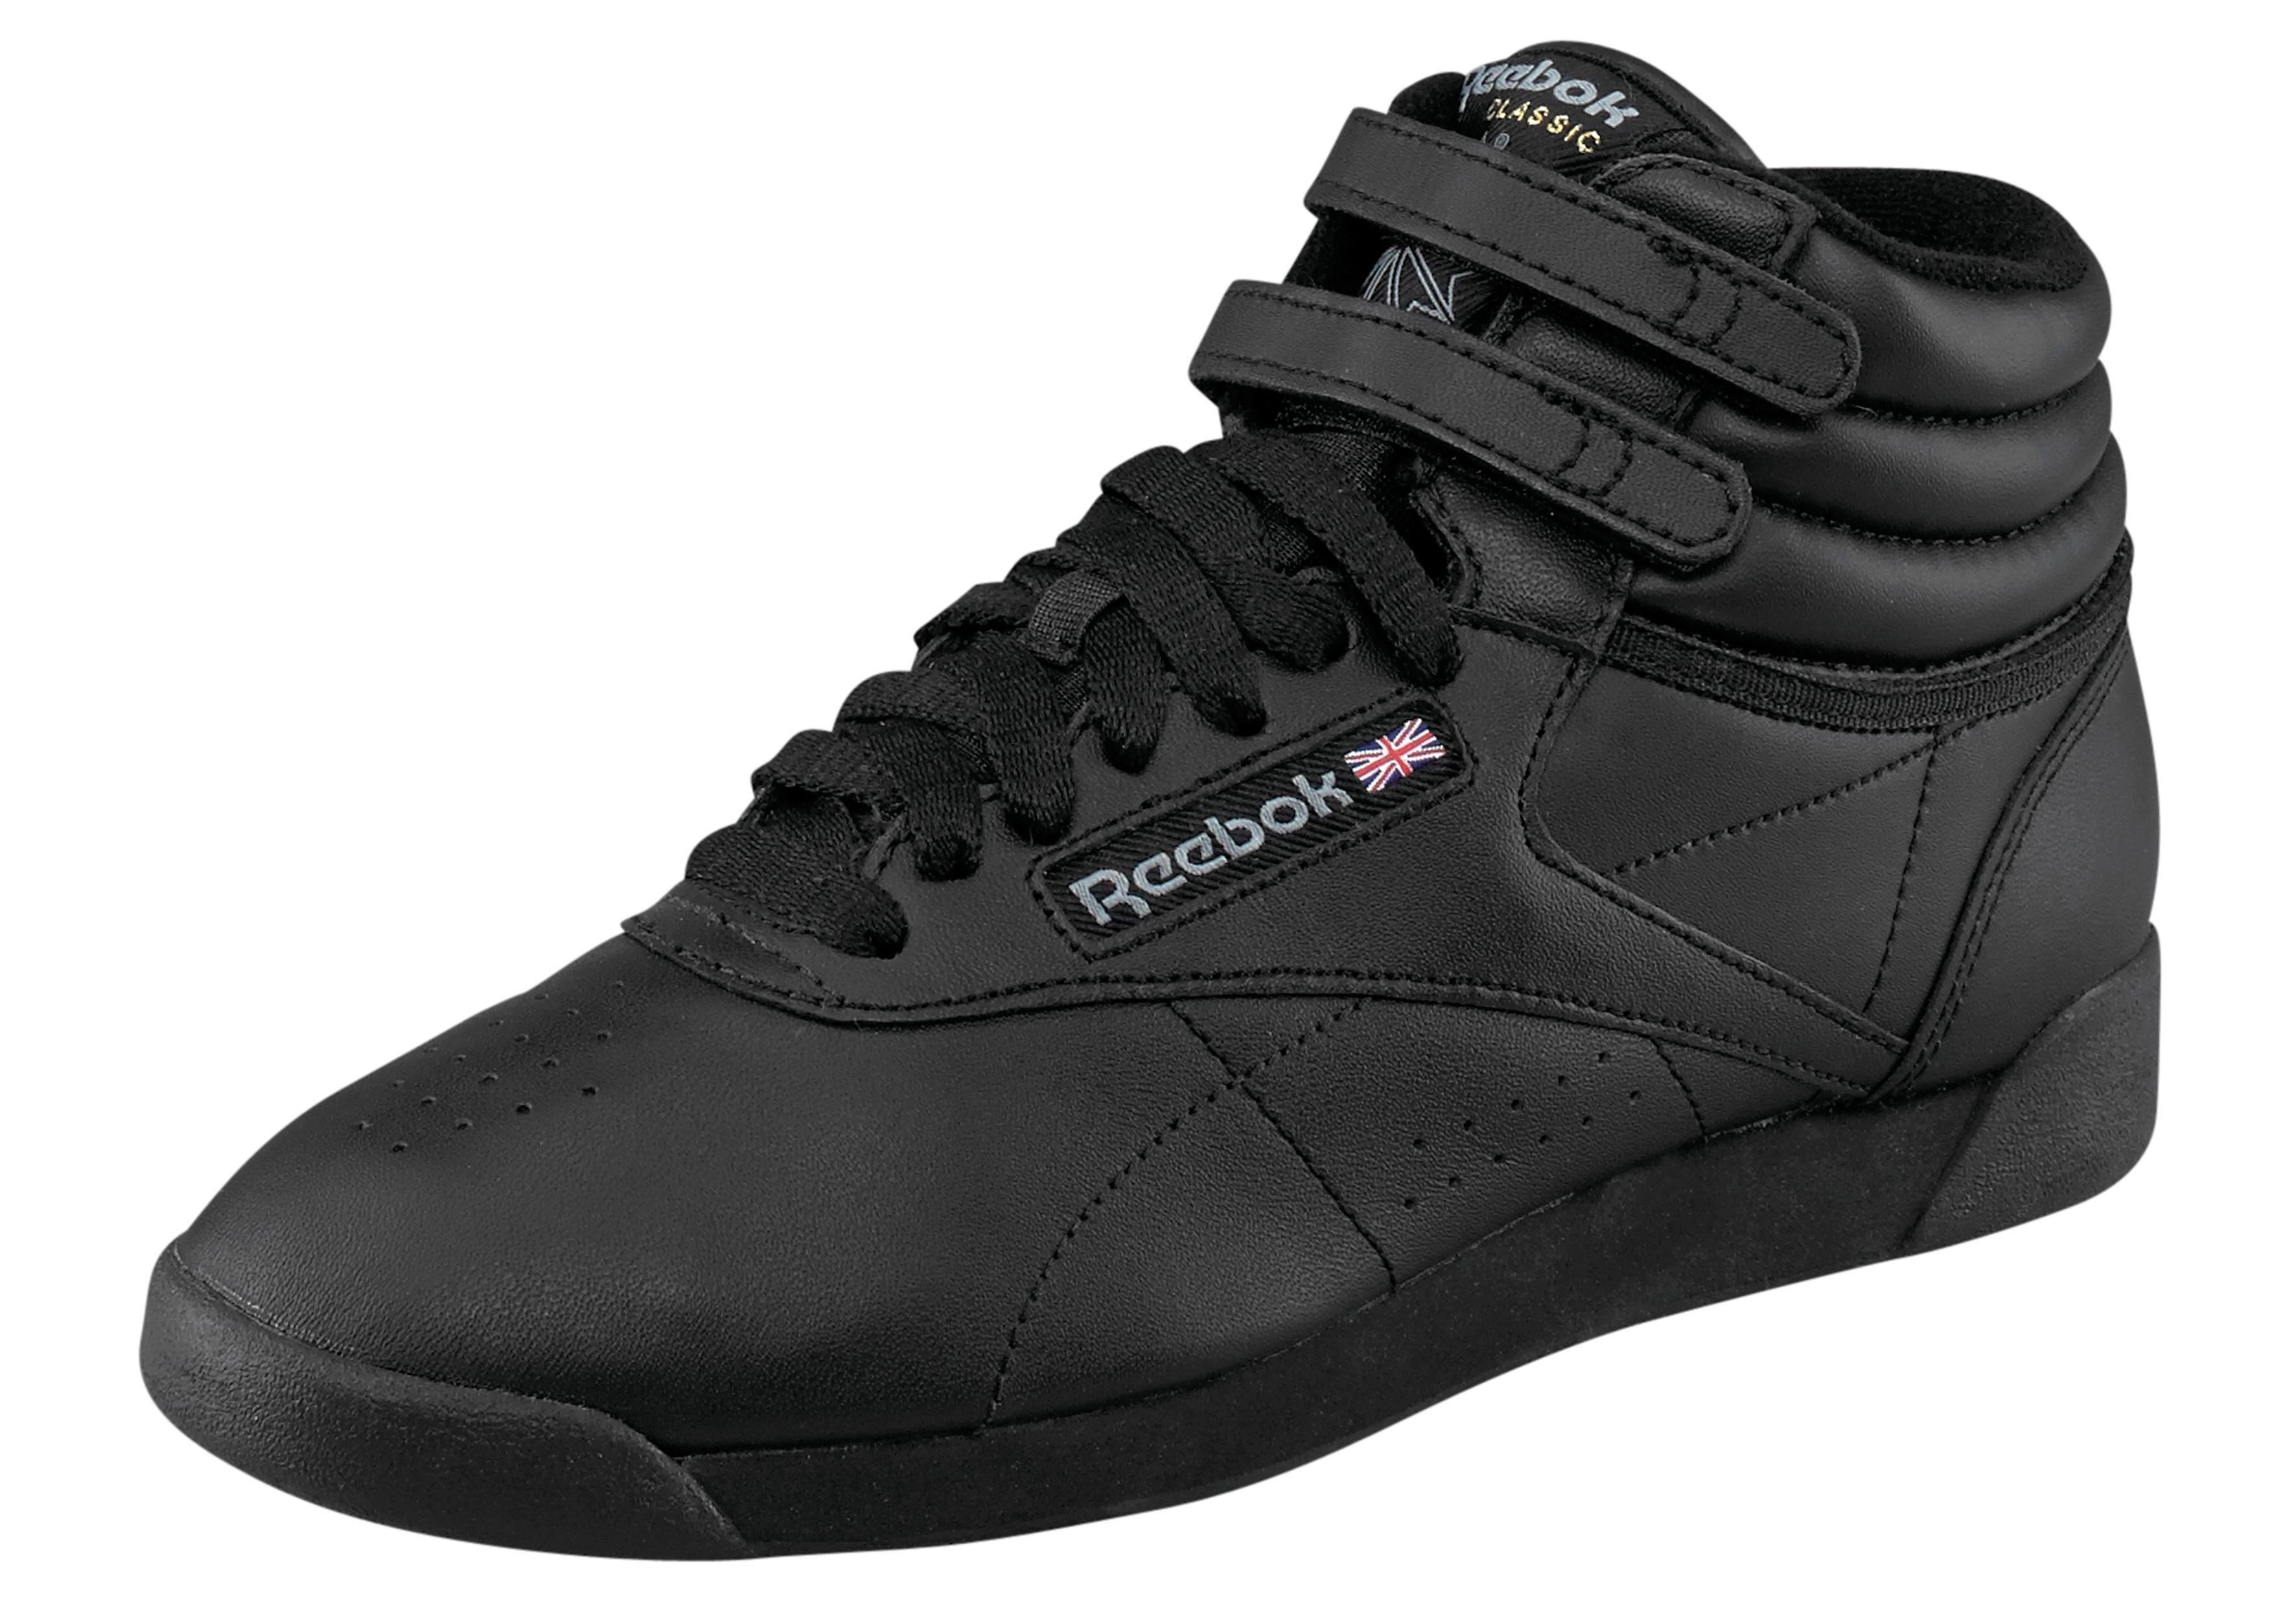 Reebok Classic REEBOK Sneakers F/S Hi online kopen op otto.nl